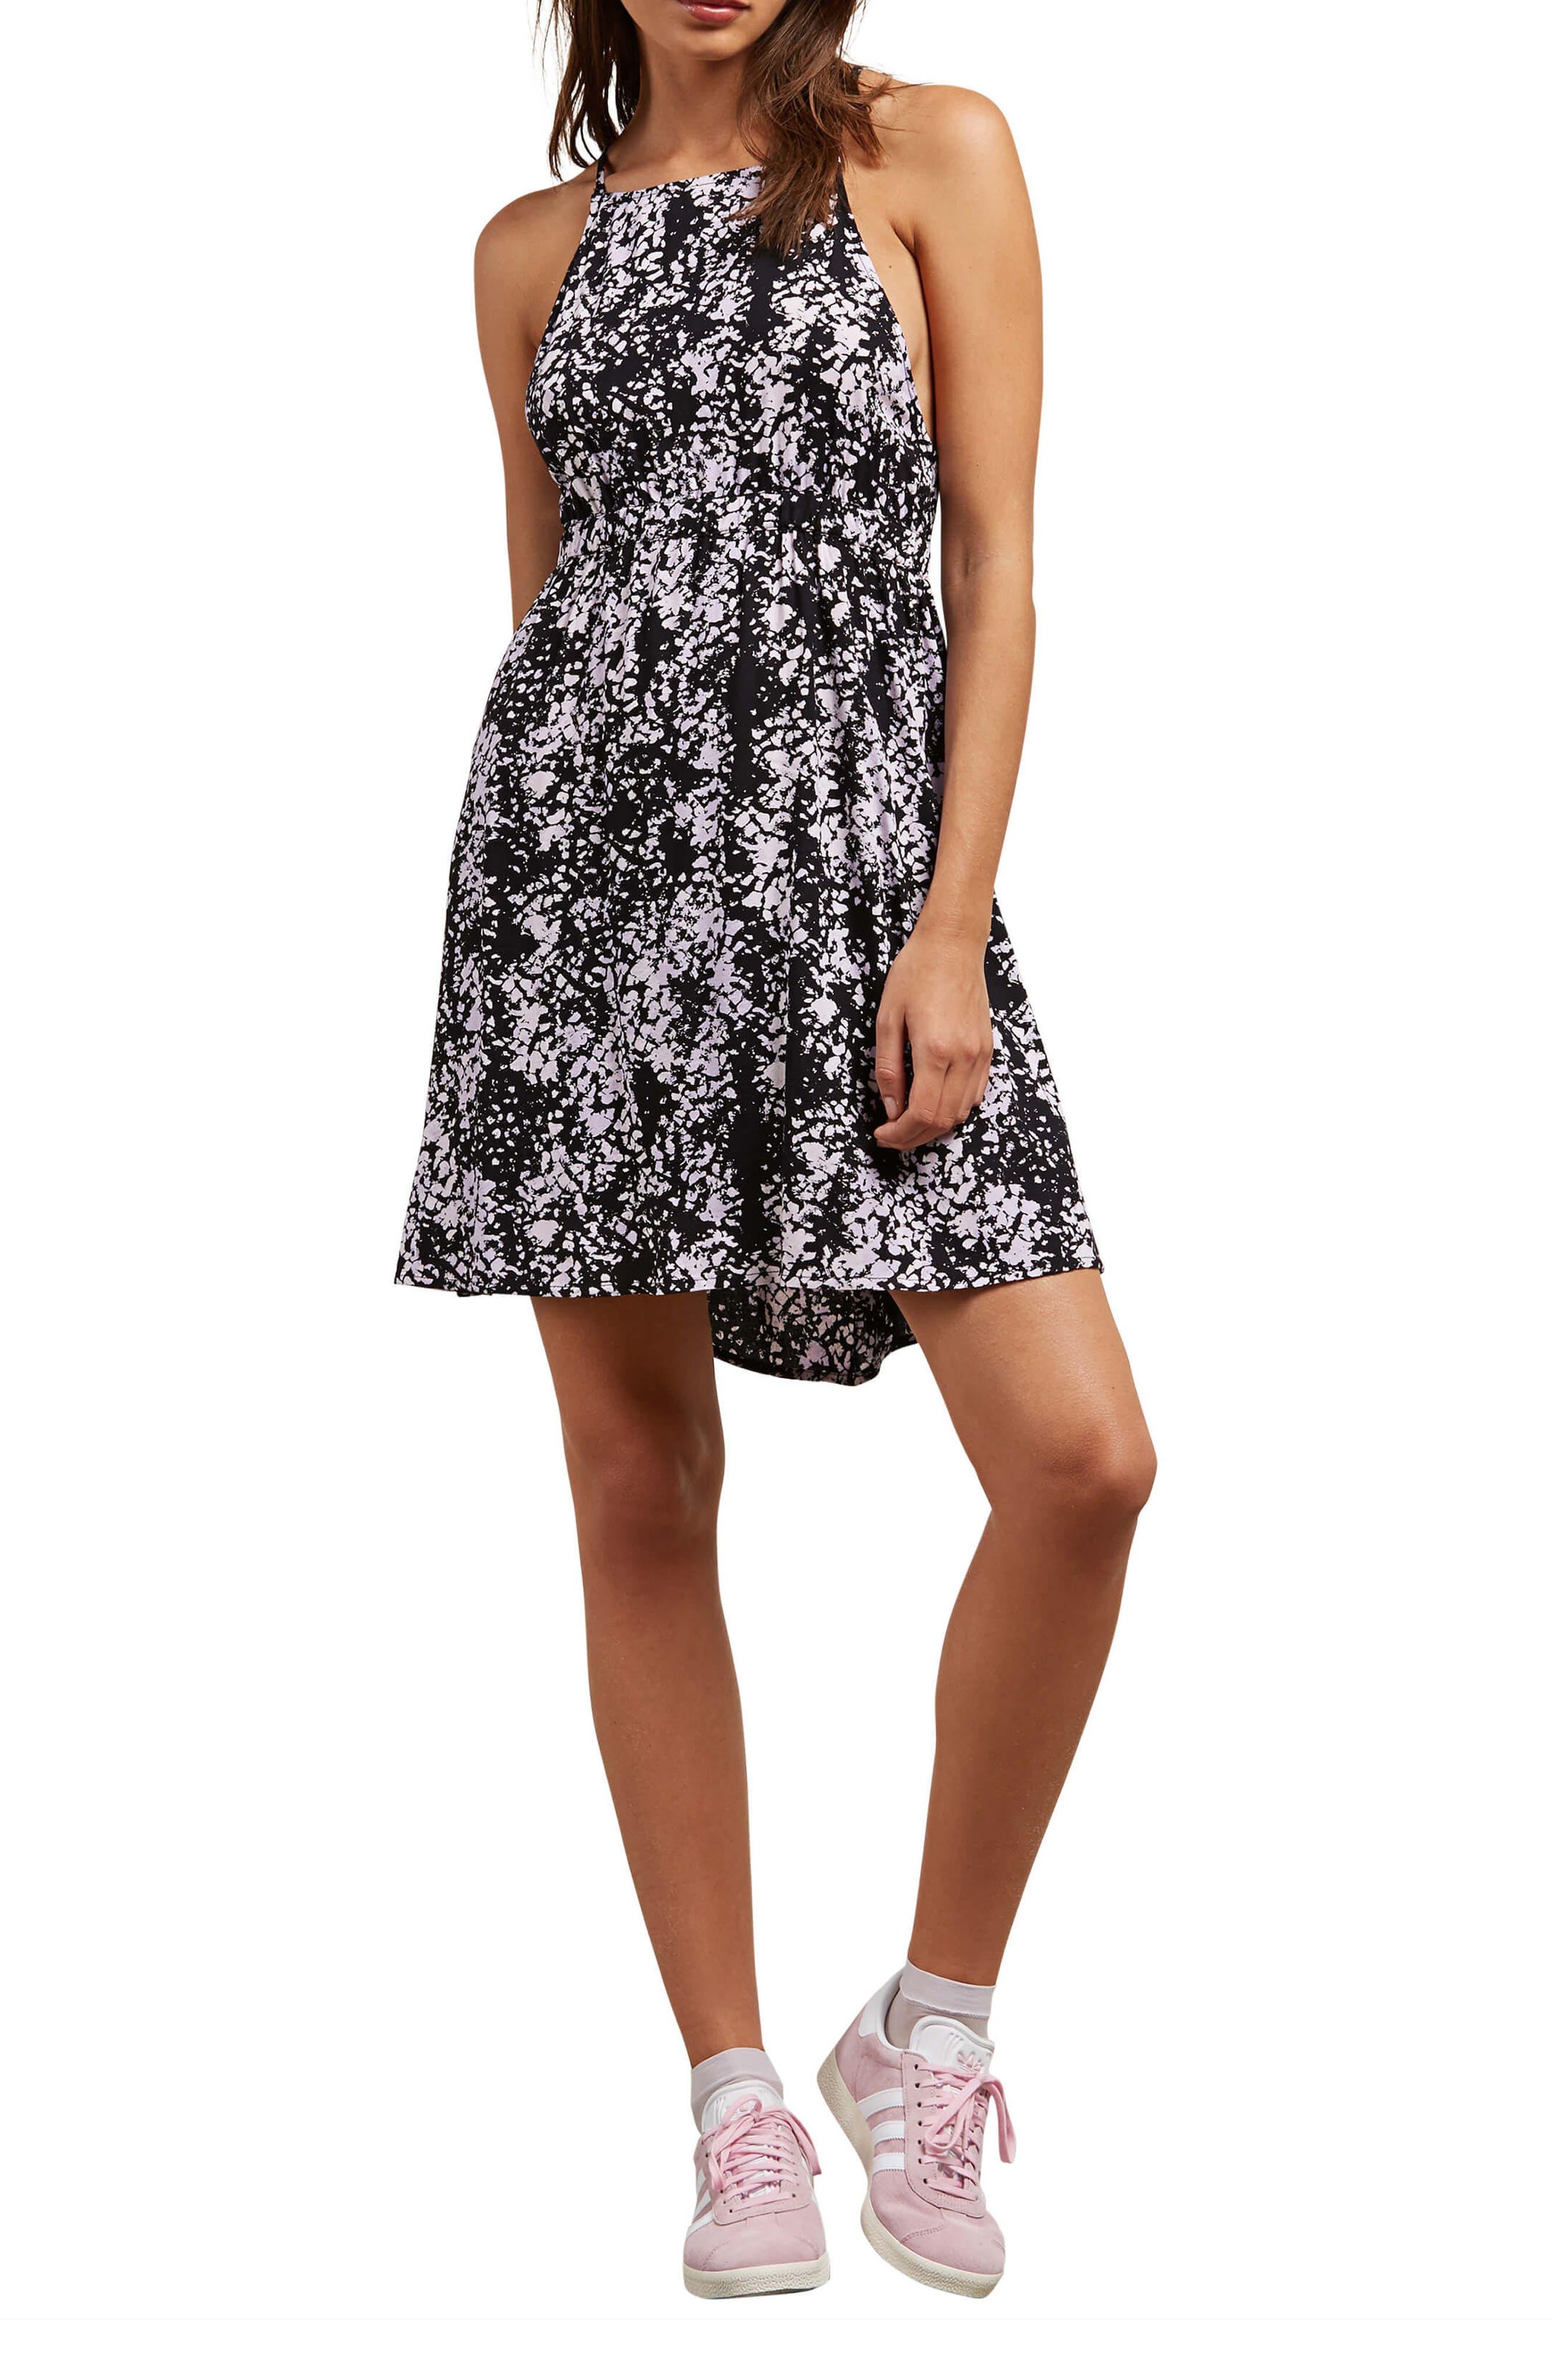 Volcom Sidesnaked Strappy Dress